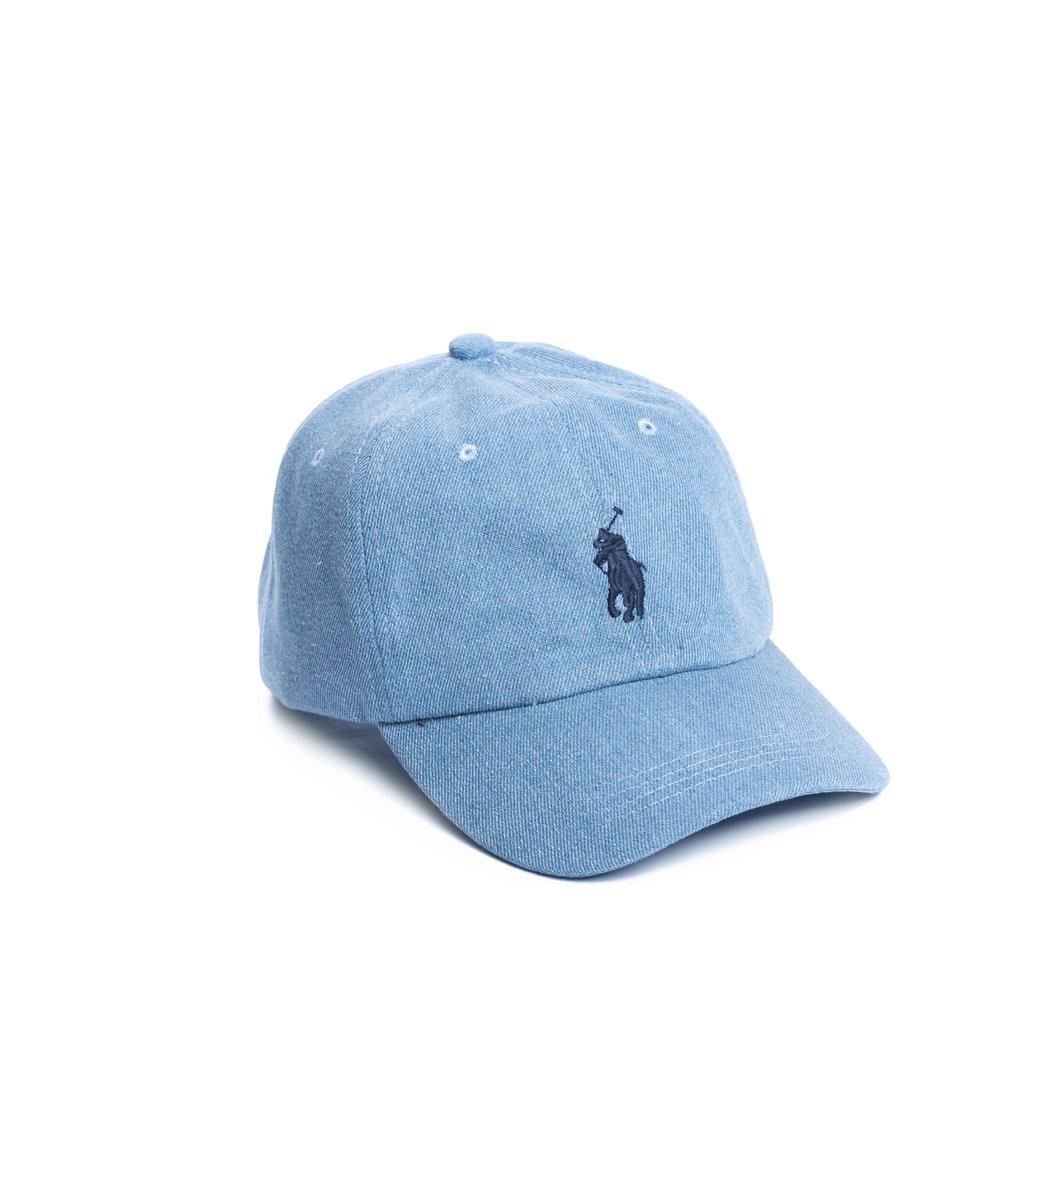 Кепка POLO Ralph Lauren Premiere Голубой/синий - Голубой - Вид 1